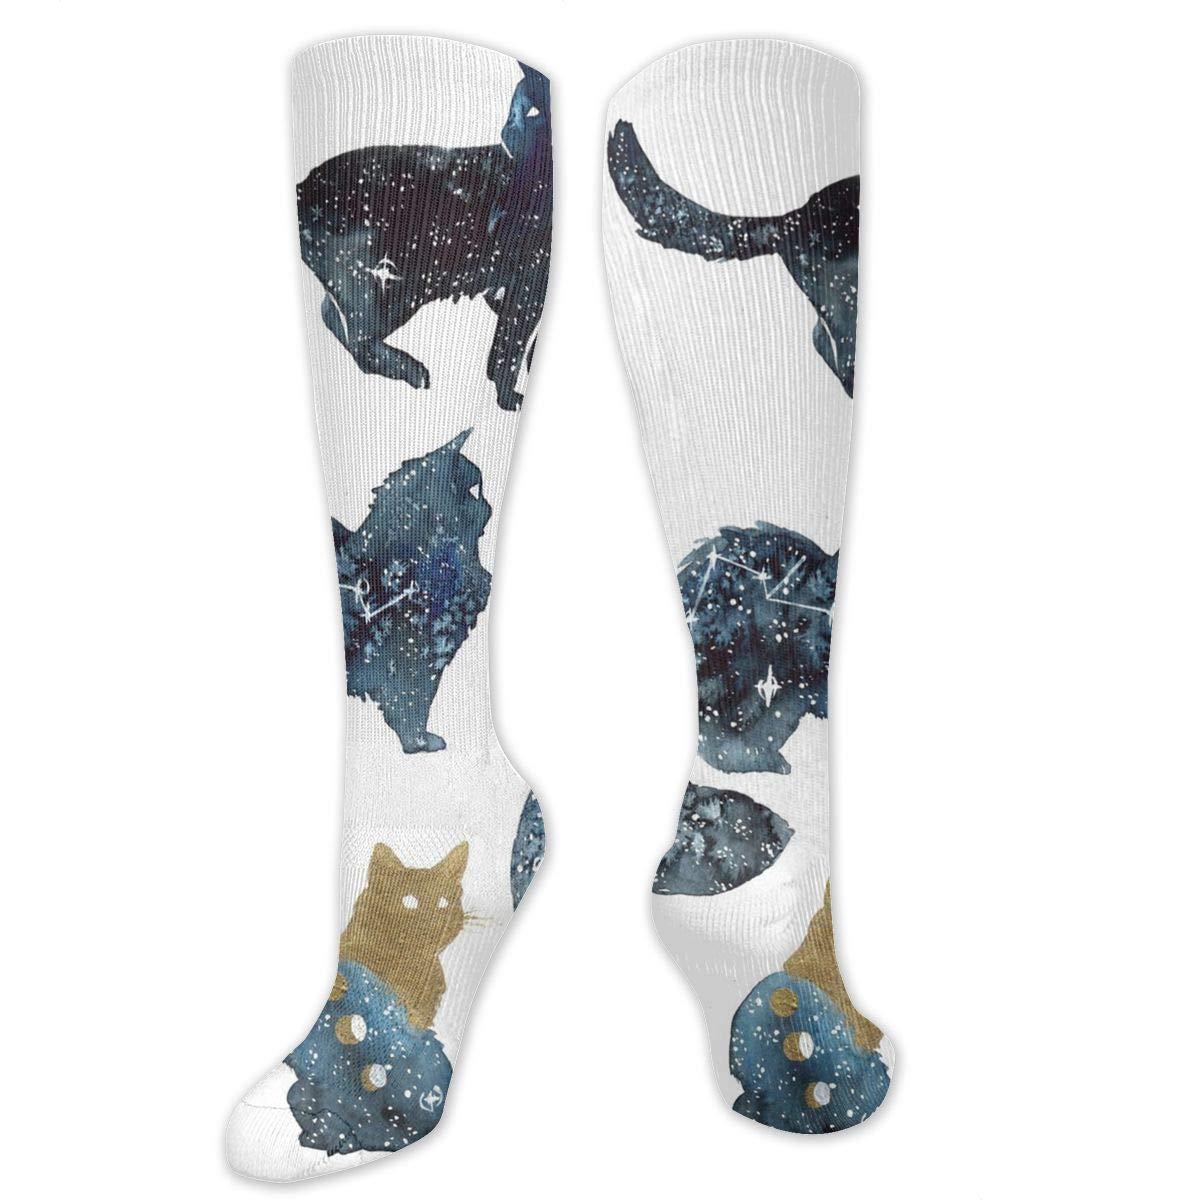 Men Multicolored Pattern Fashionable Fun Crew Cotton Socks Chanwazibibiliu Galaxy Cats by Threeleaves Mens Colorful Dress Socks Funky